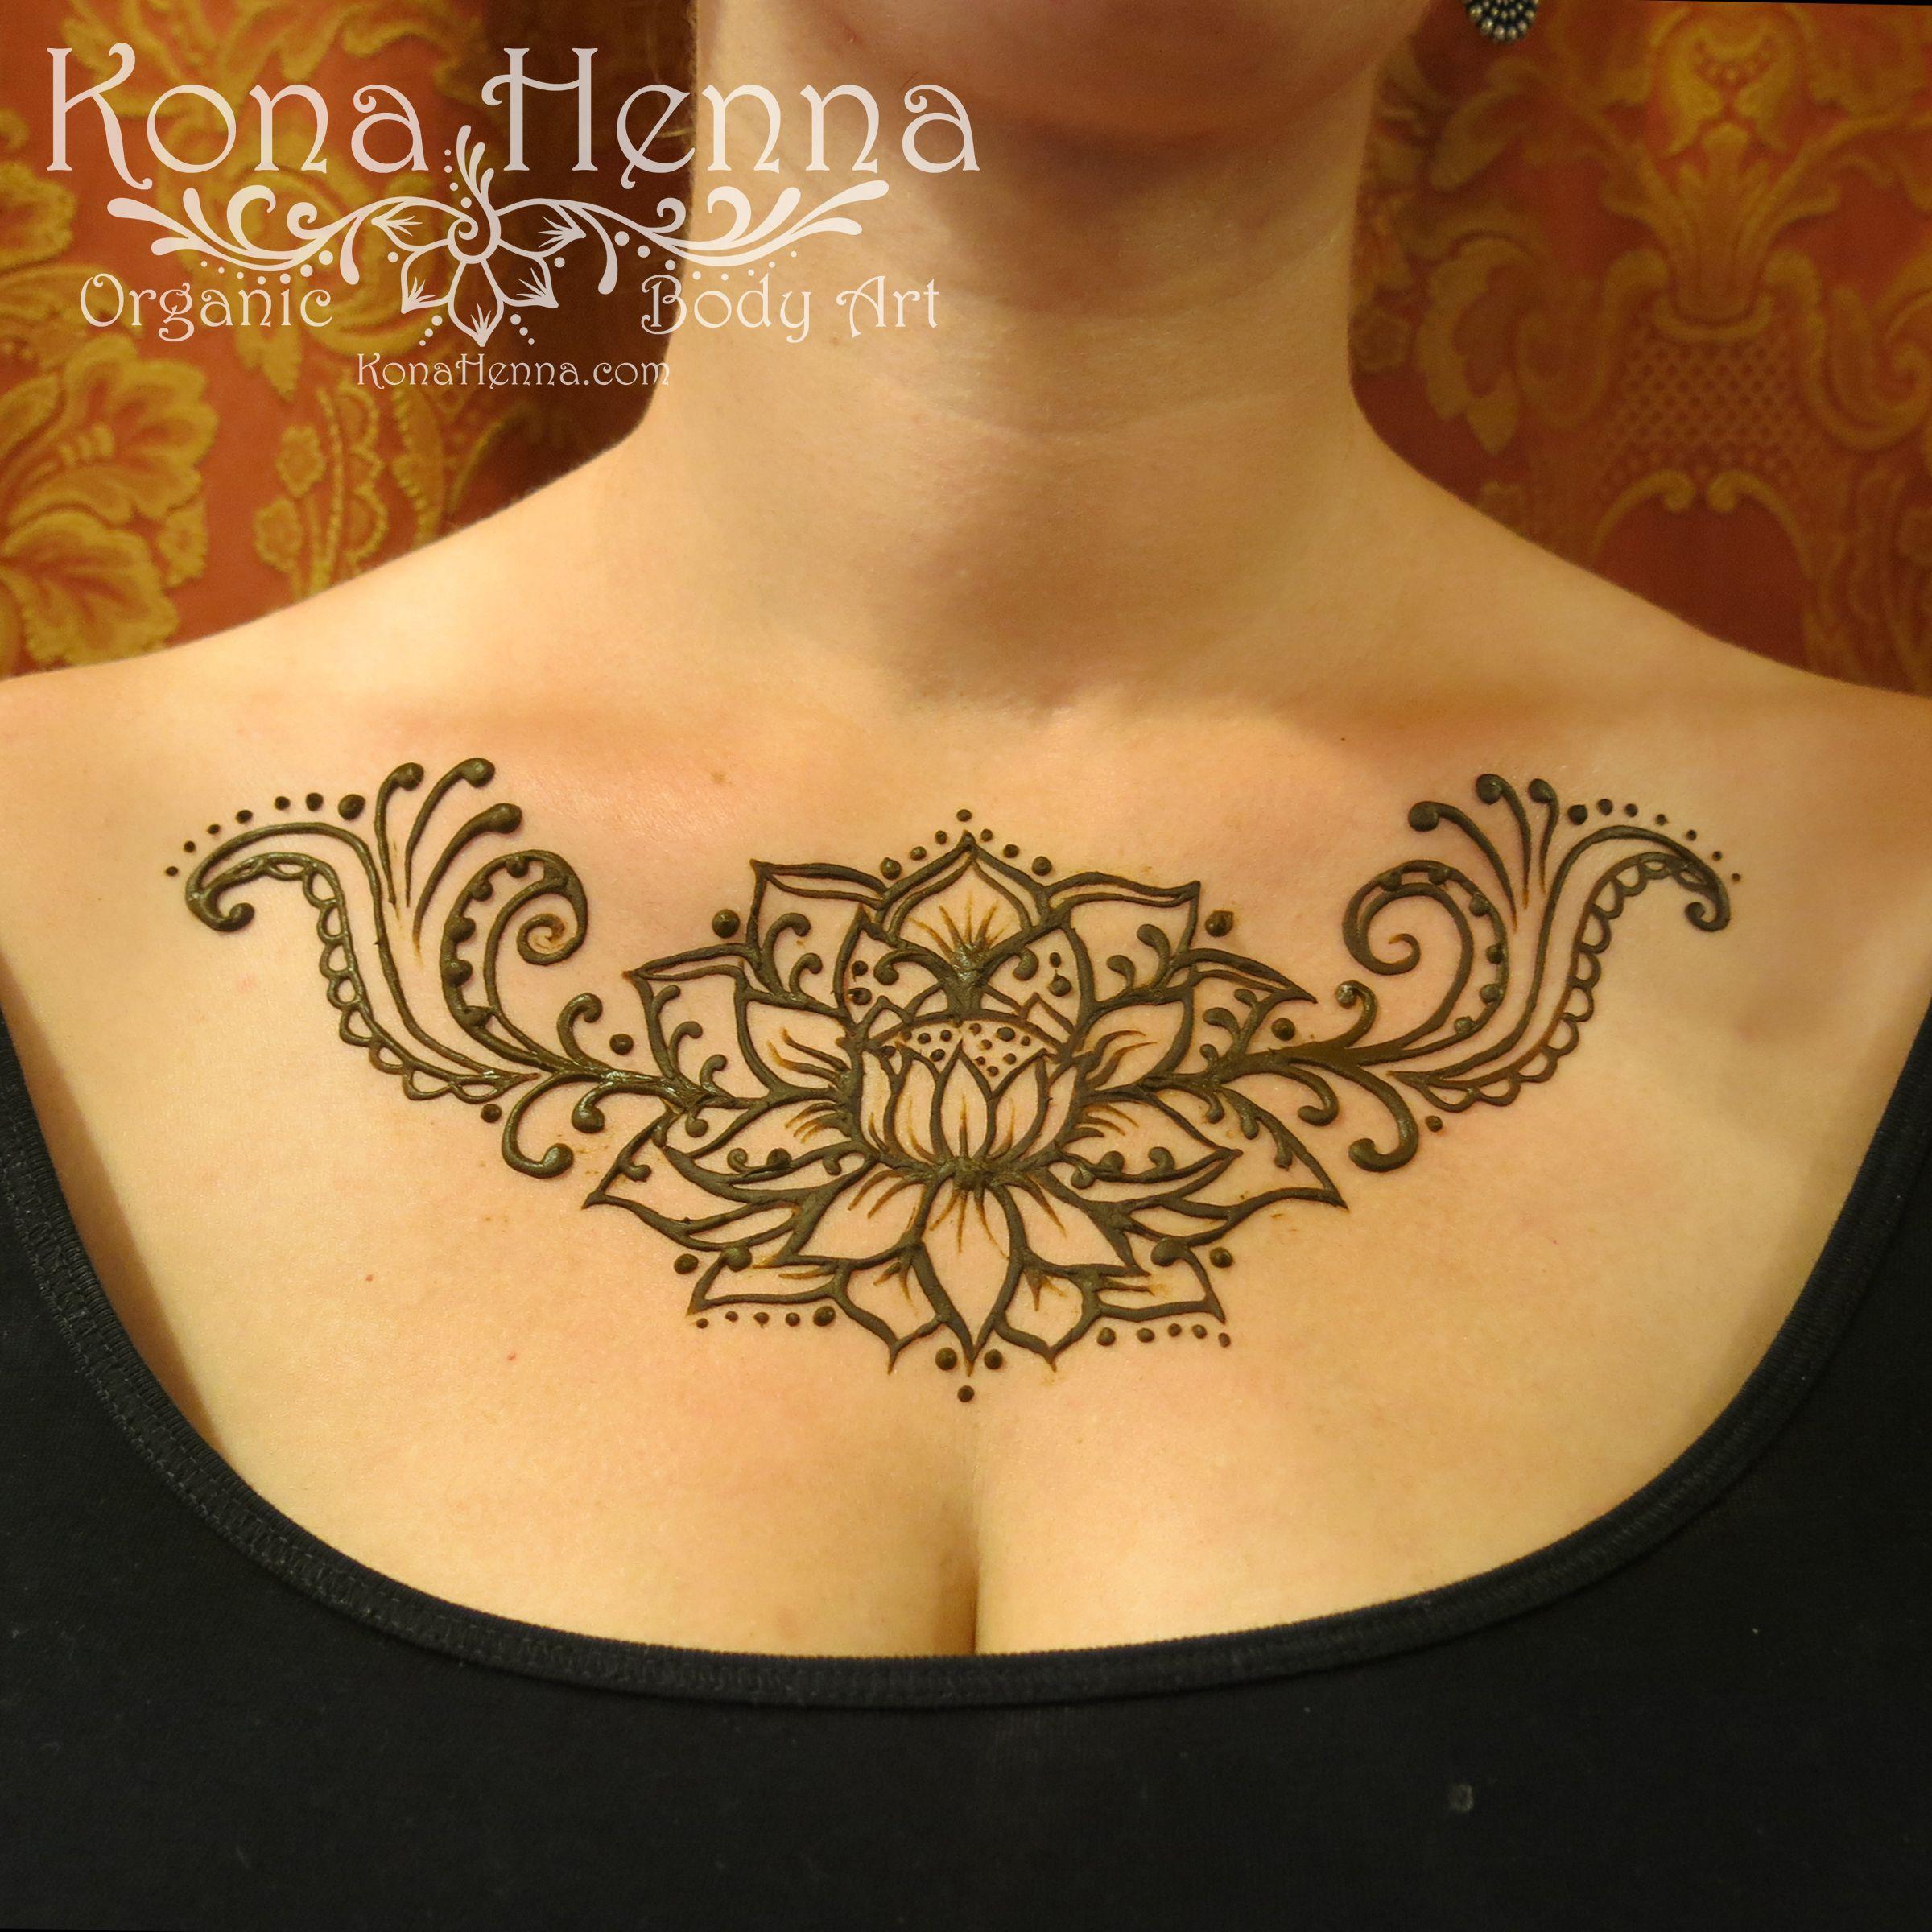 Organic Henna Products. Professional Henna Studio ...